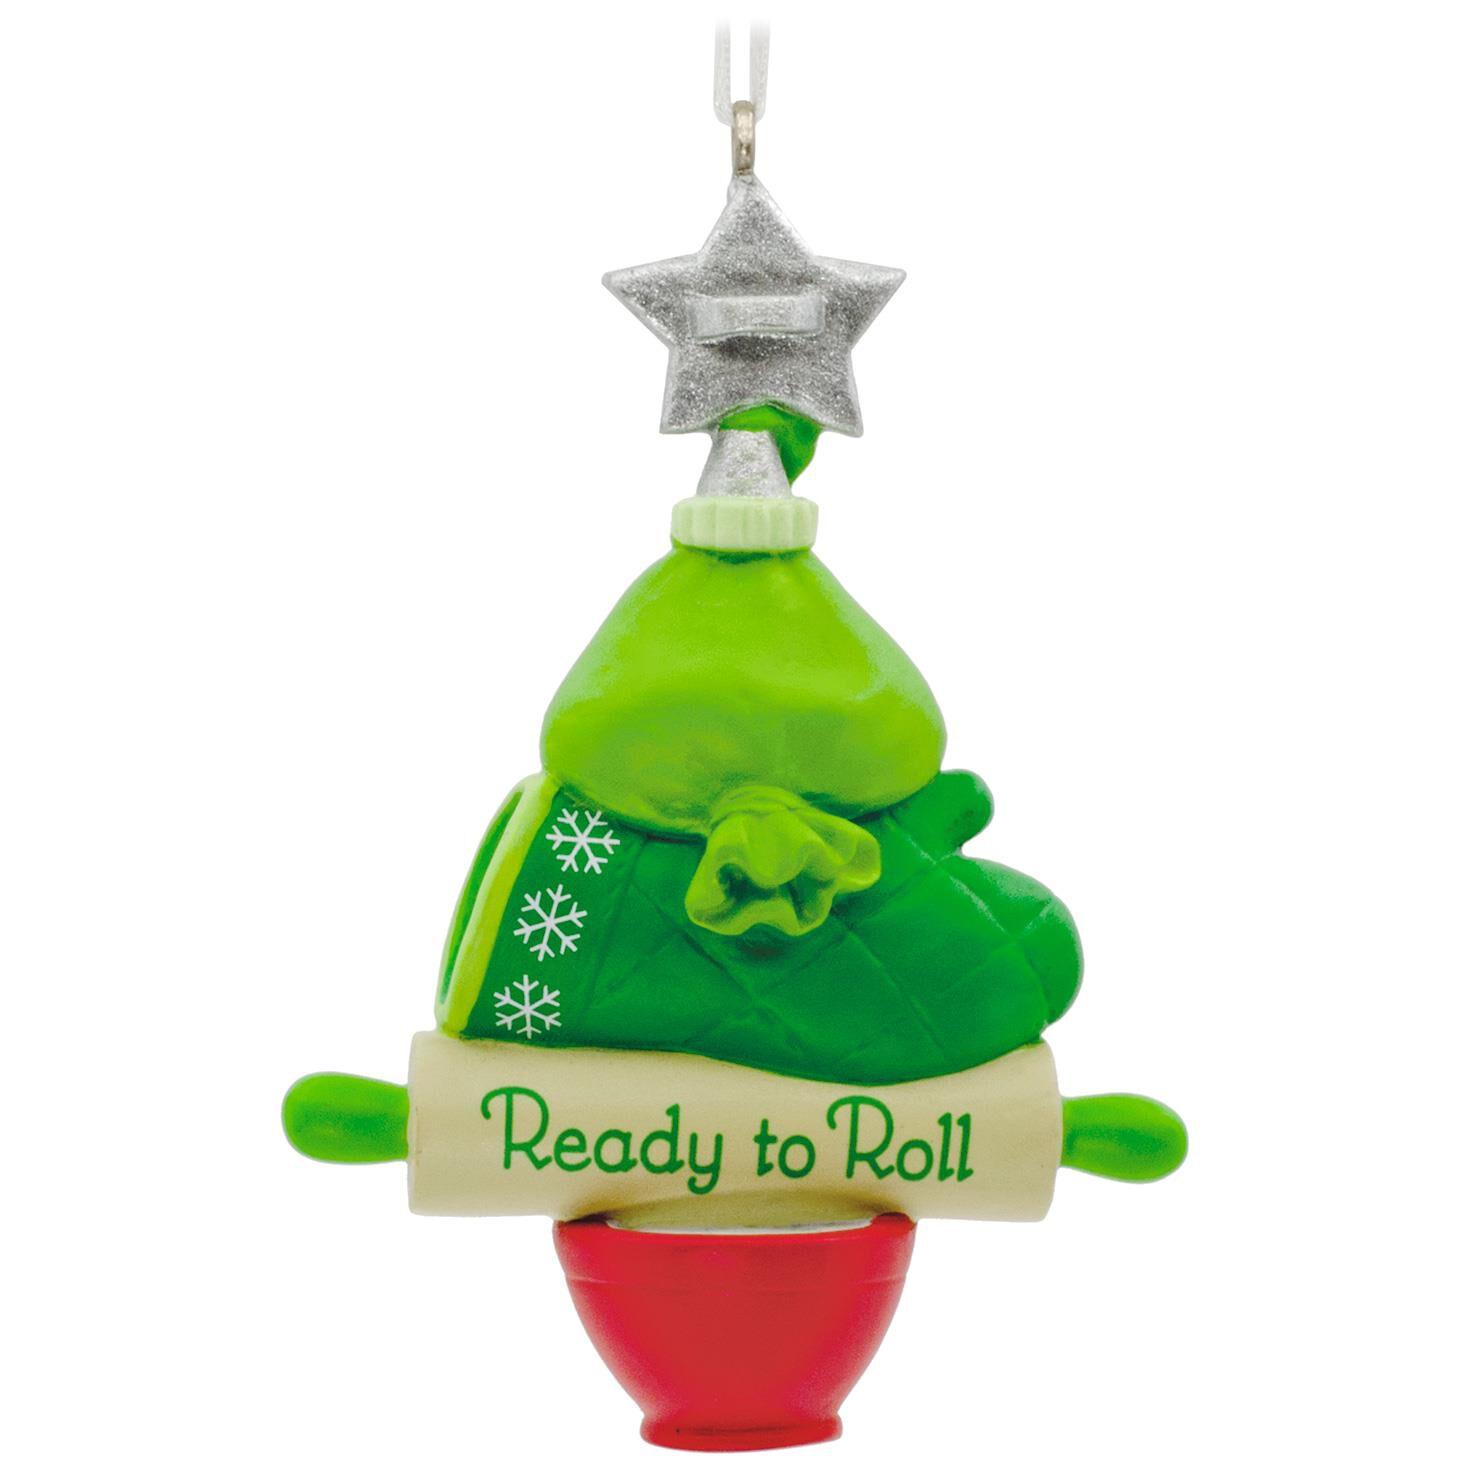 Ready To Roll Baking Christmas Tree Hallmark Ornament  Gift Ornaments   Hallmark